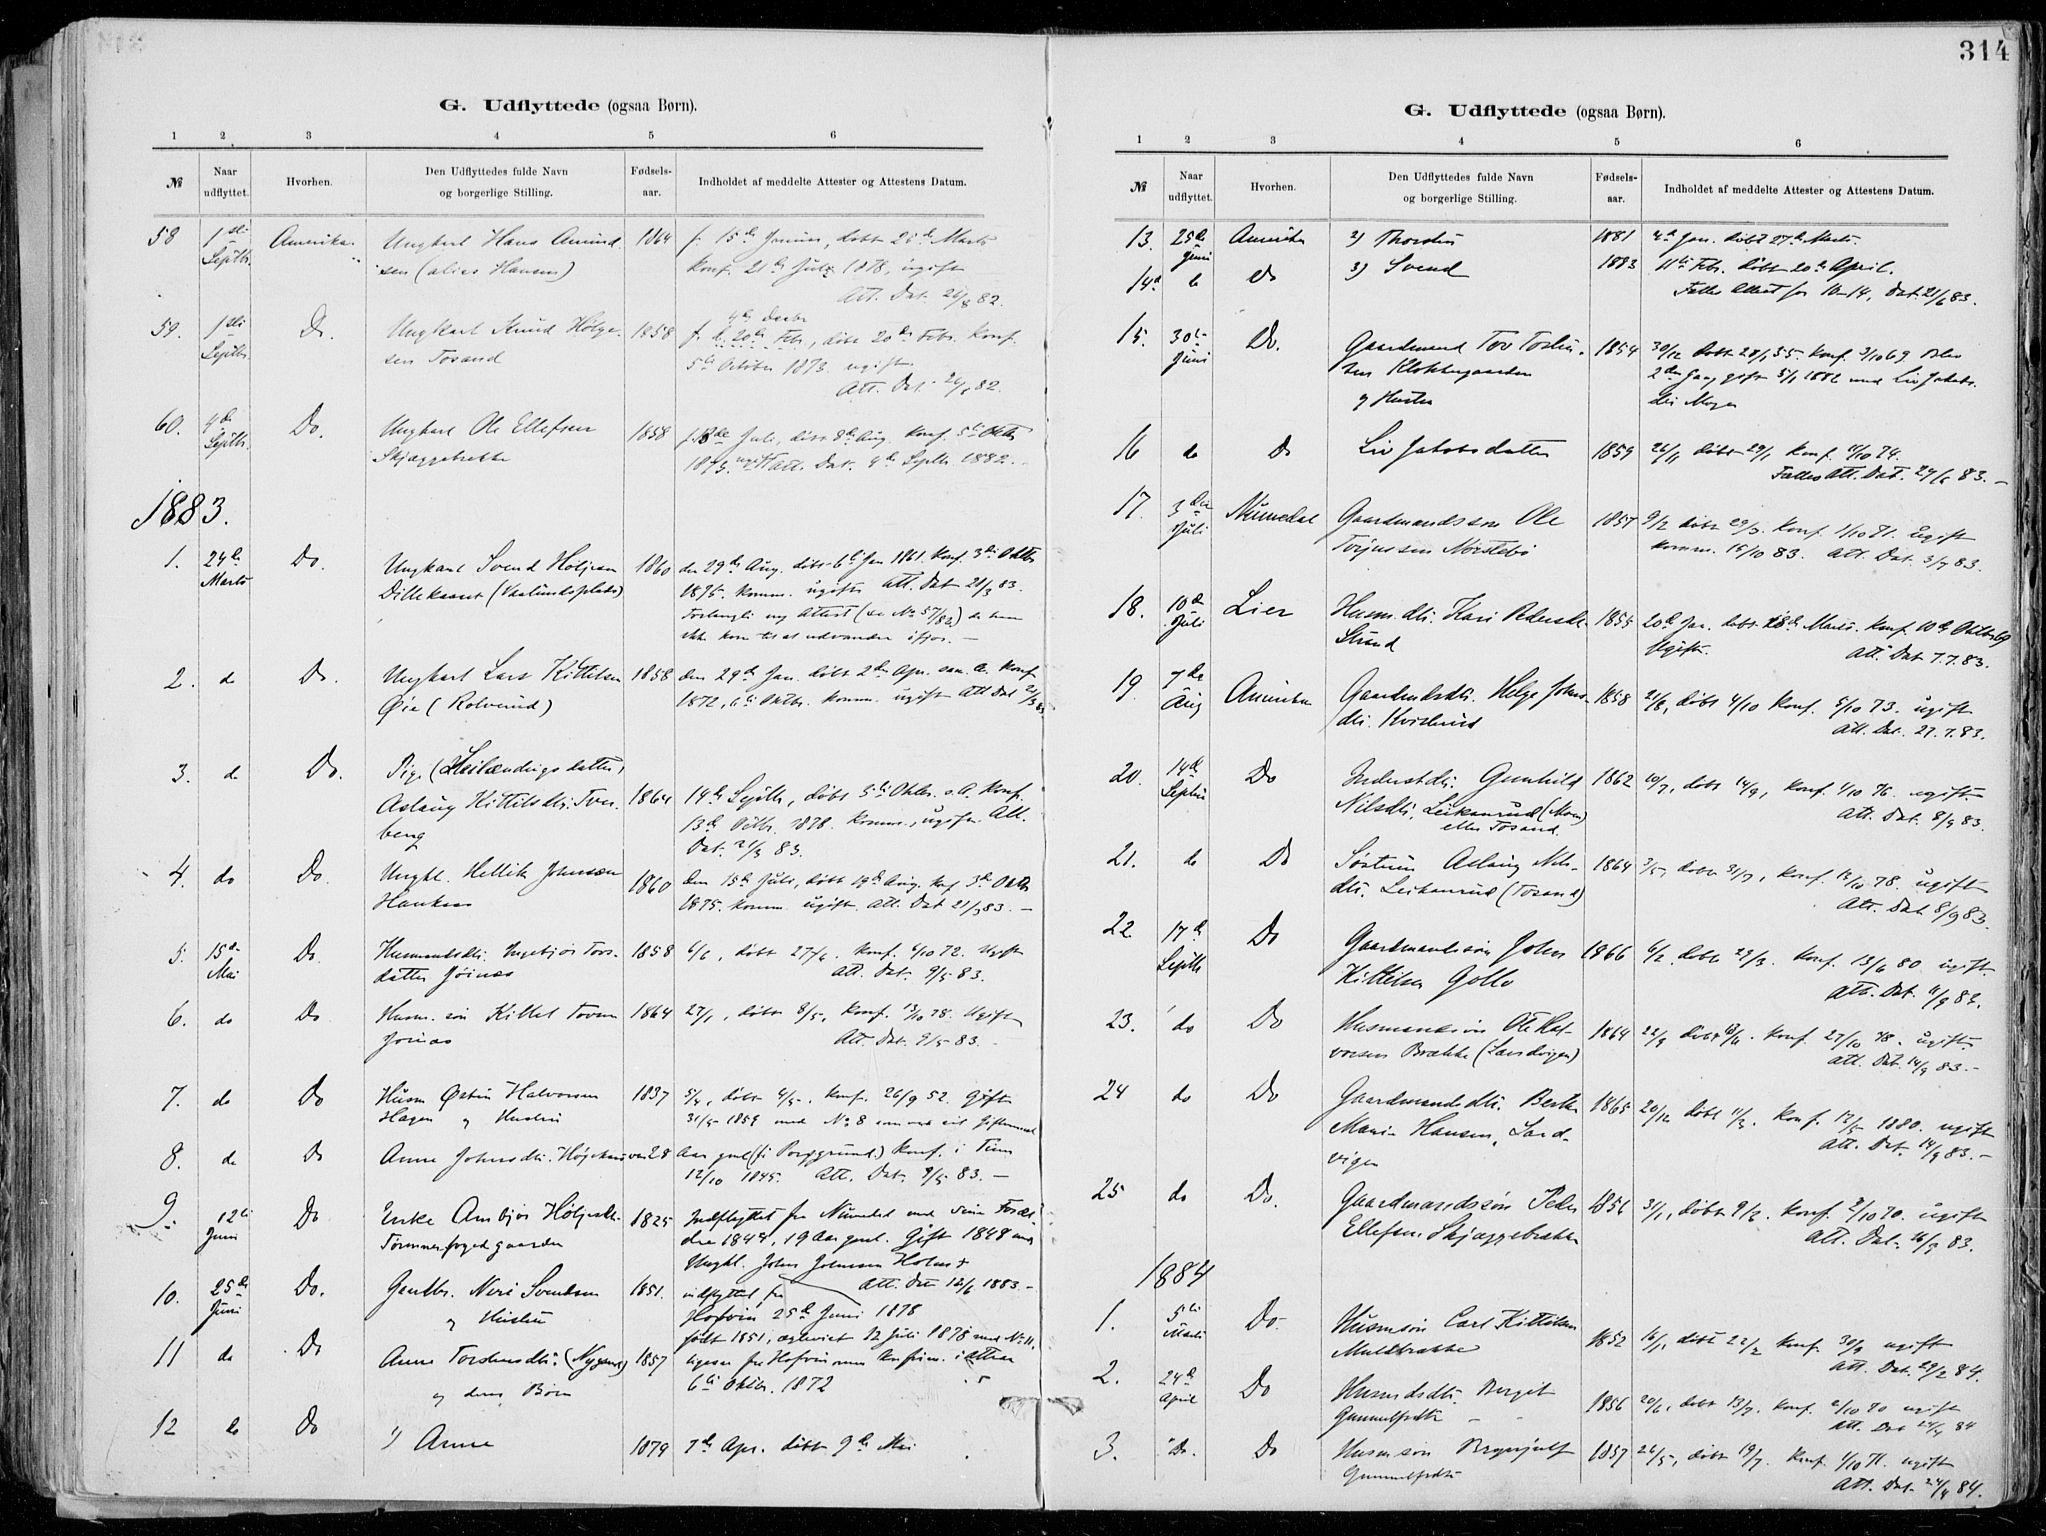 SAKO, Tinn kirkebøker, F/Fa/L0007: Ministerialbok nr. I 7, 1878-1922, s. 314